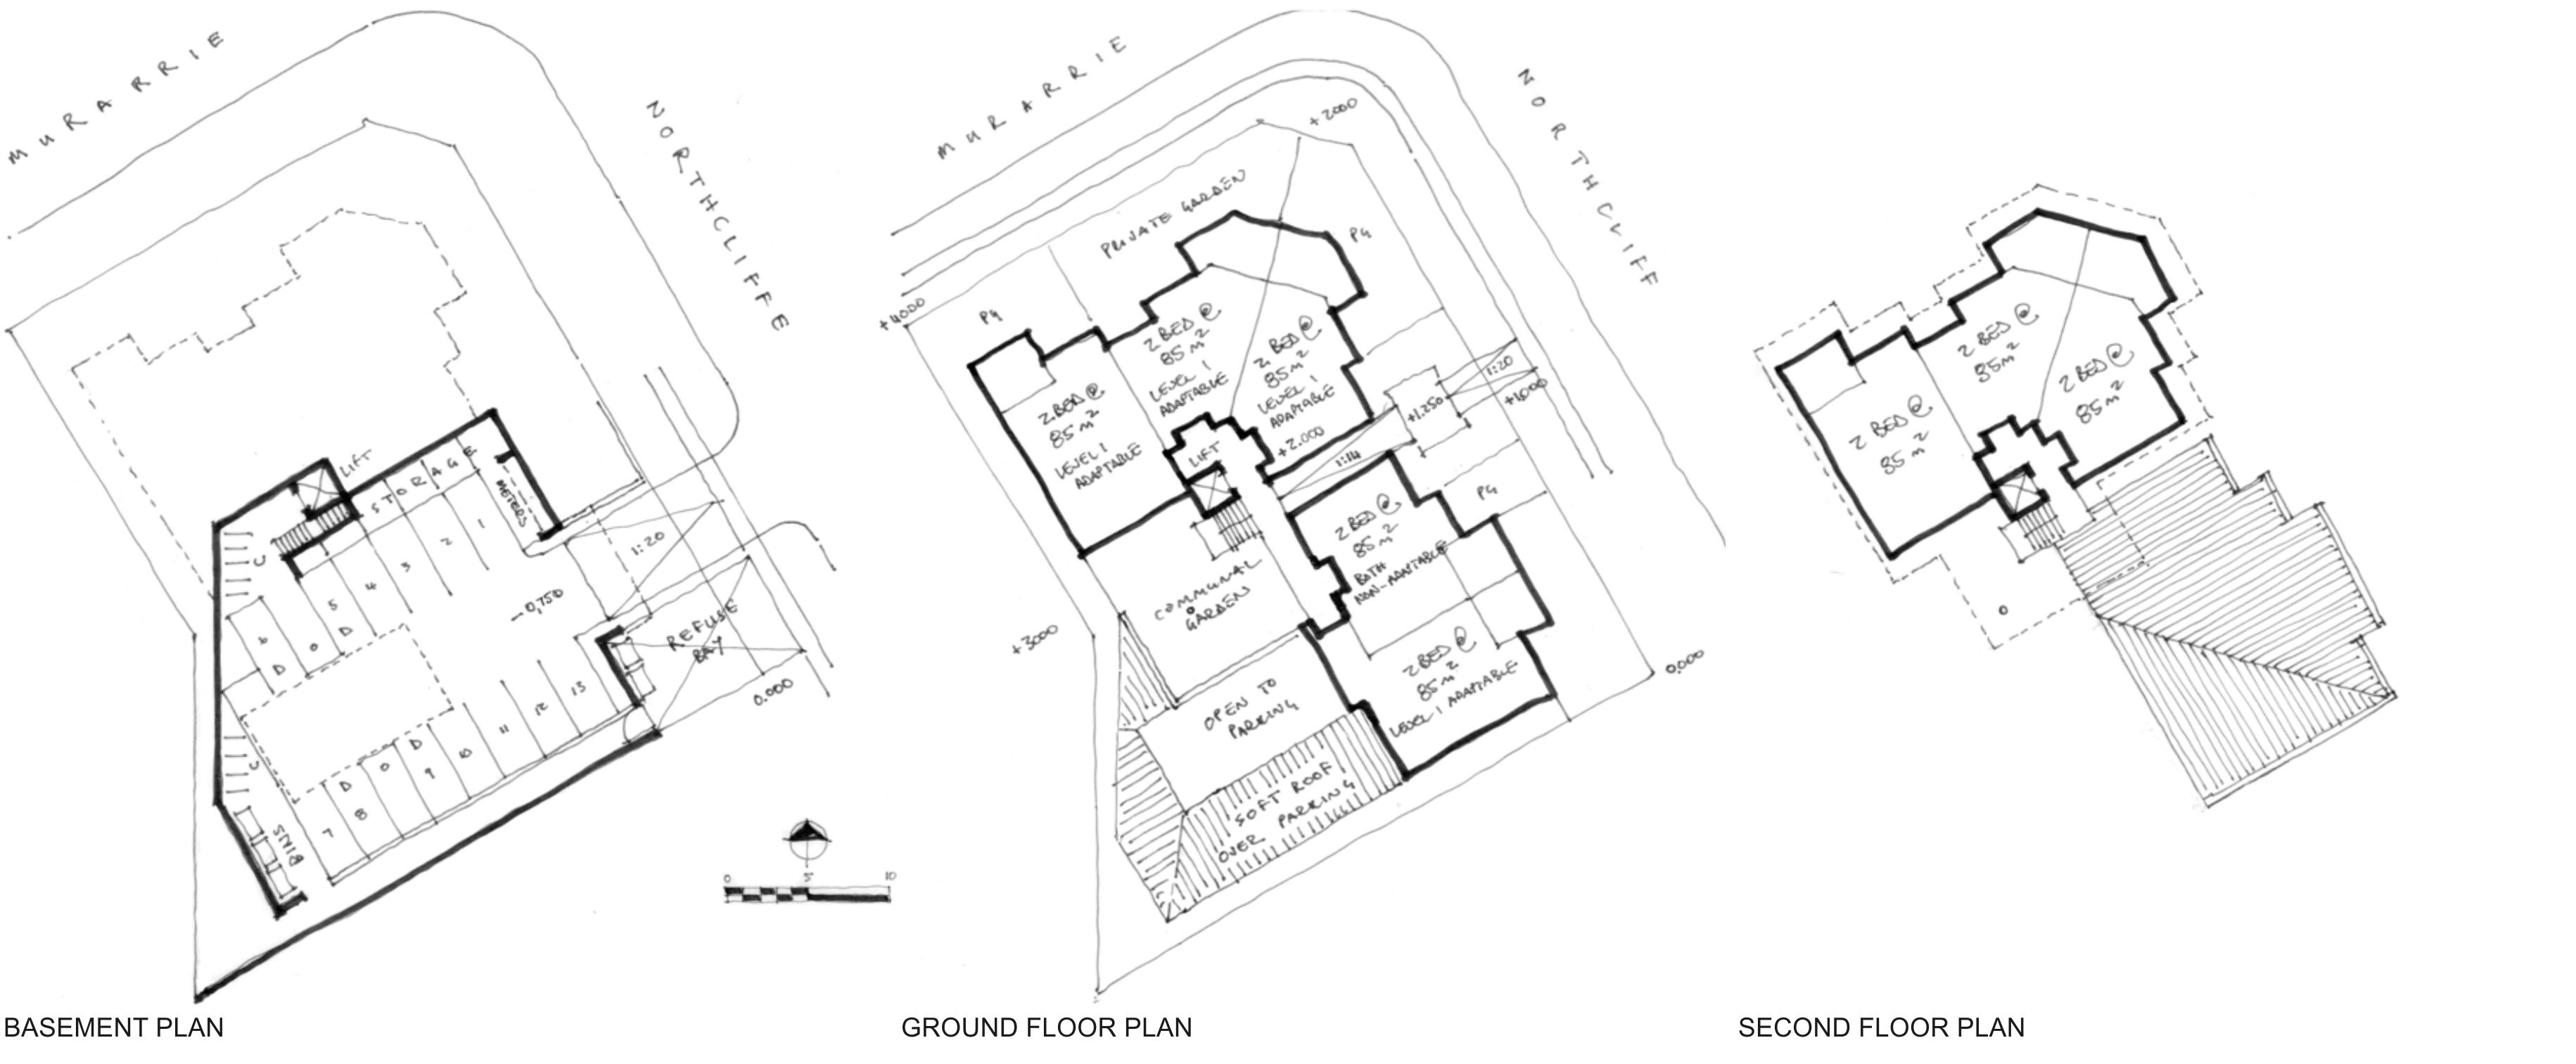 DHPW - Concept Plan 2015